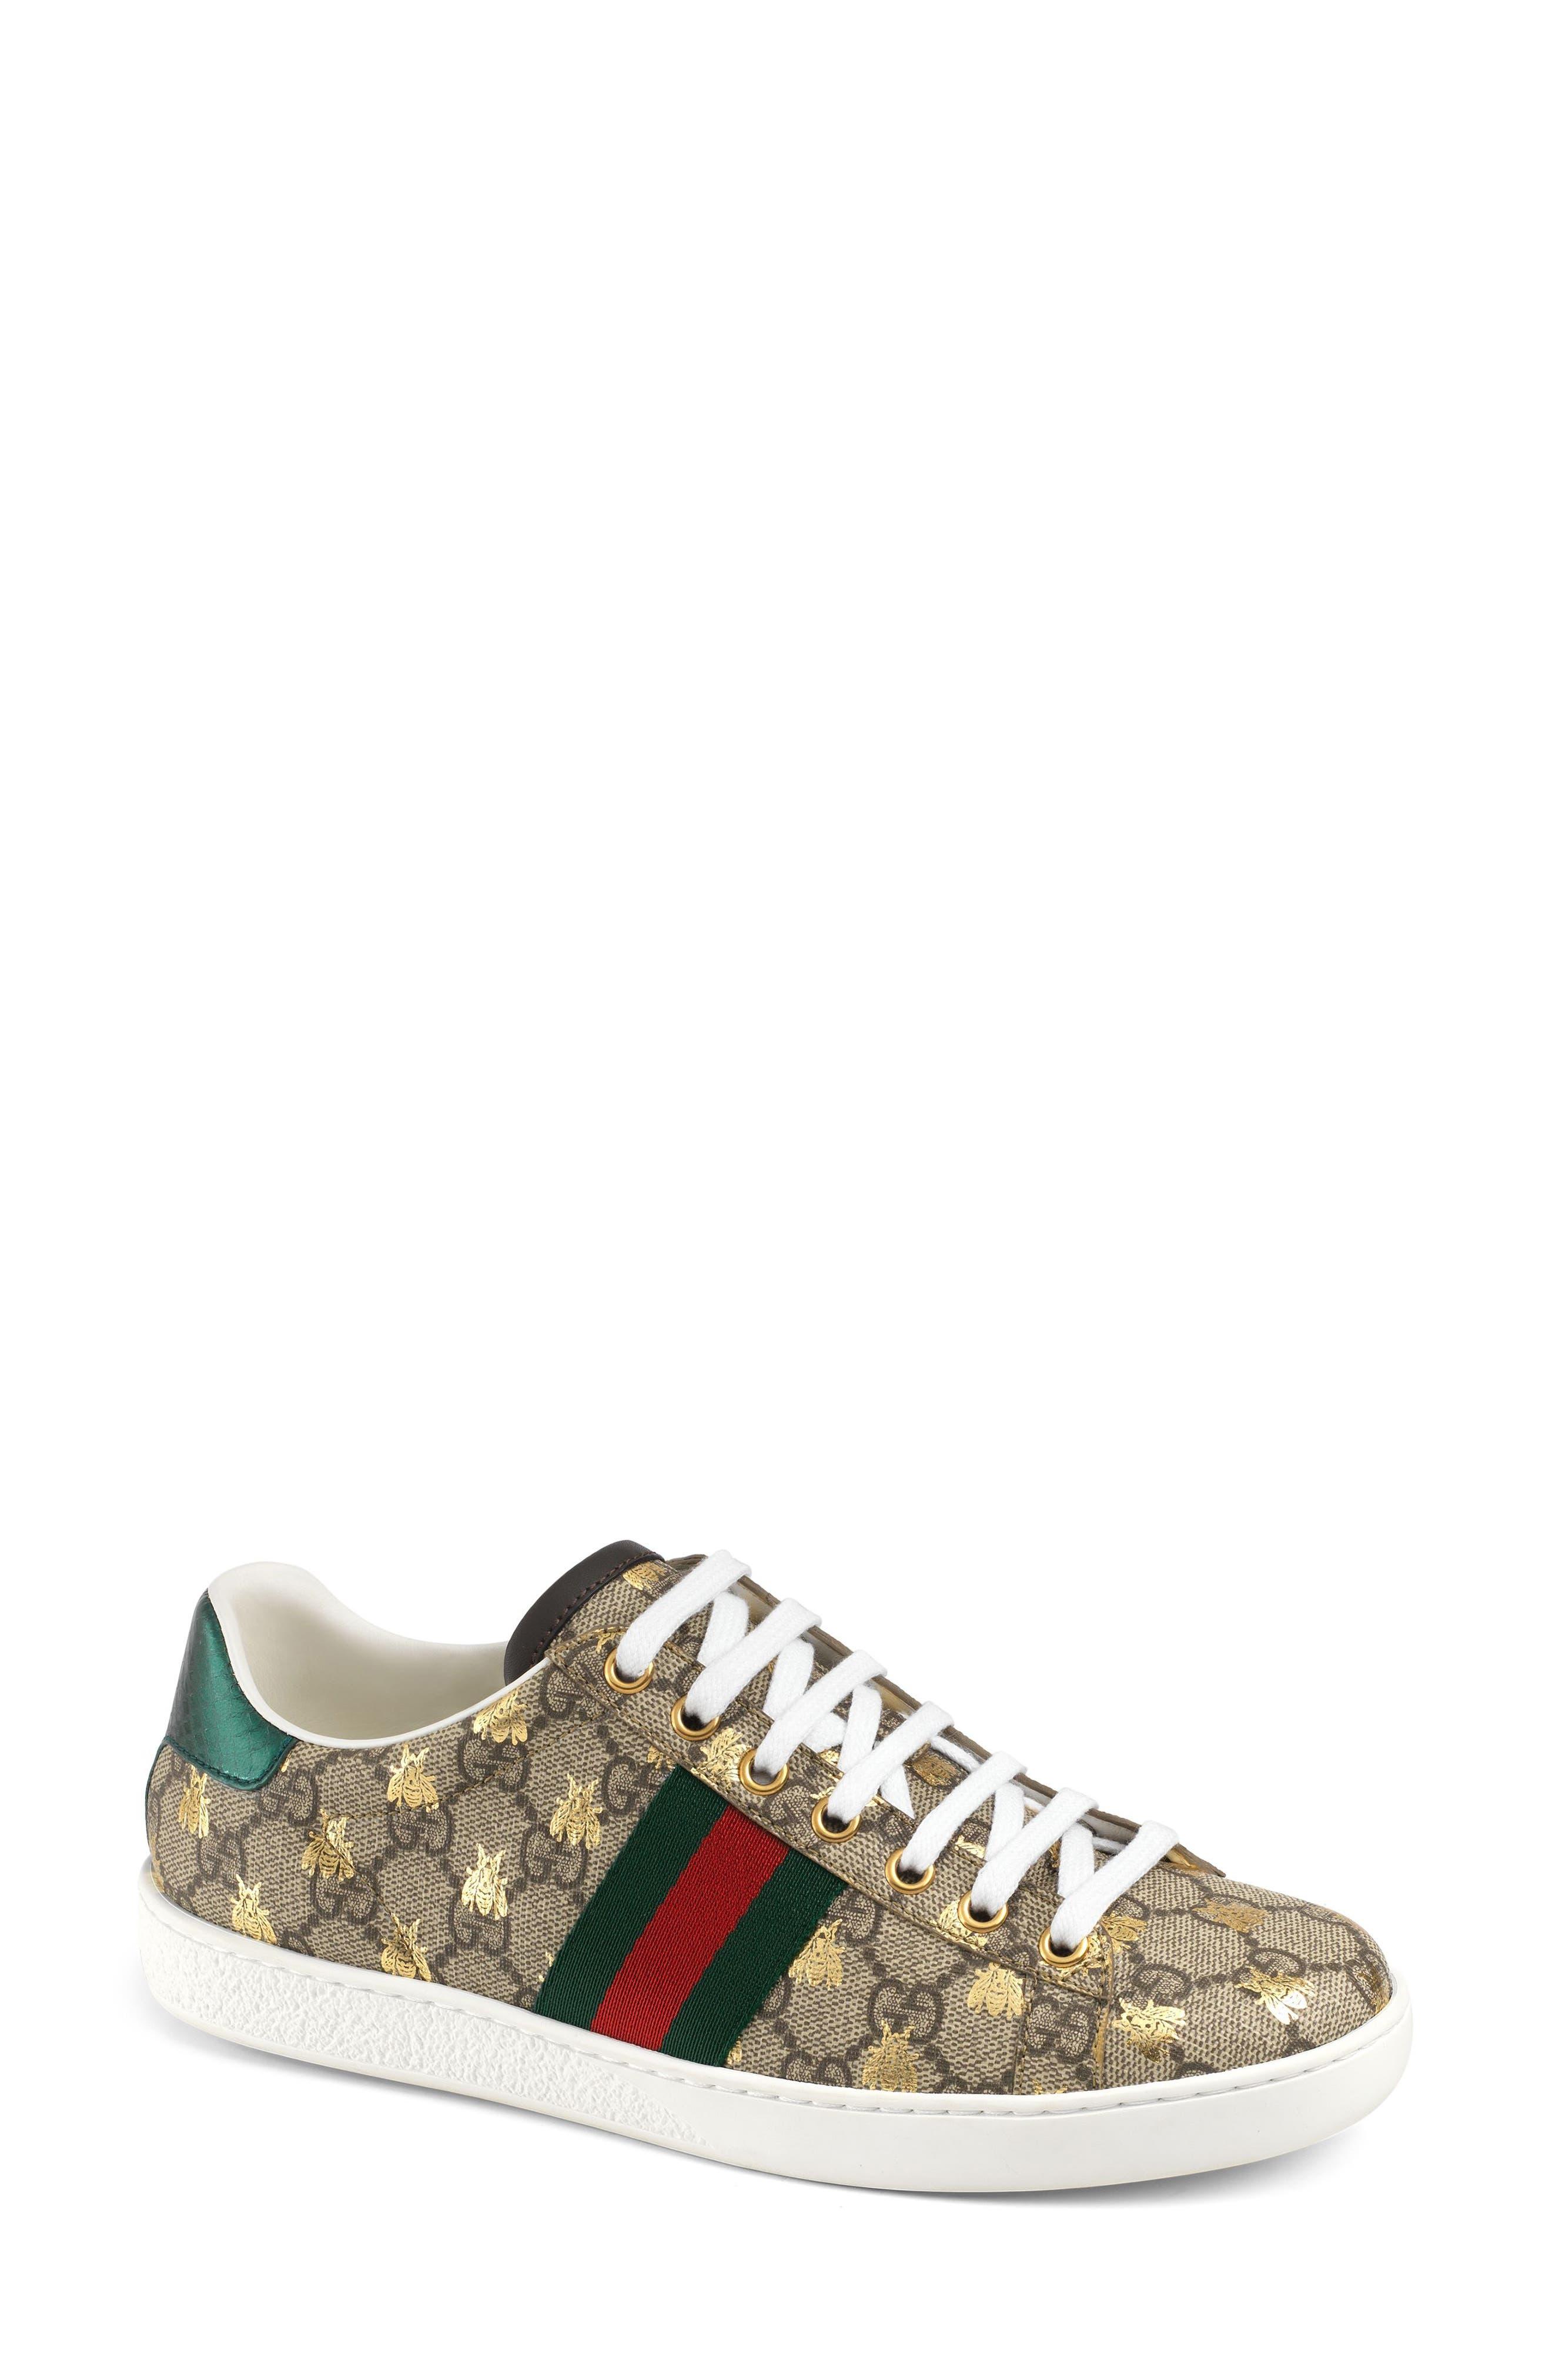 New Ace Monogram Bee Sneaker,                         Main,                         color, BEIGE/ GOLD